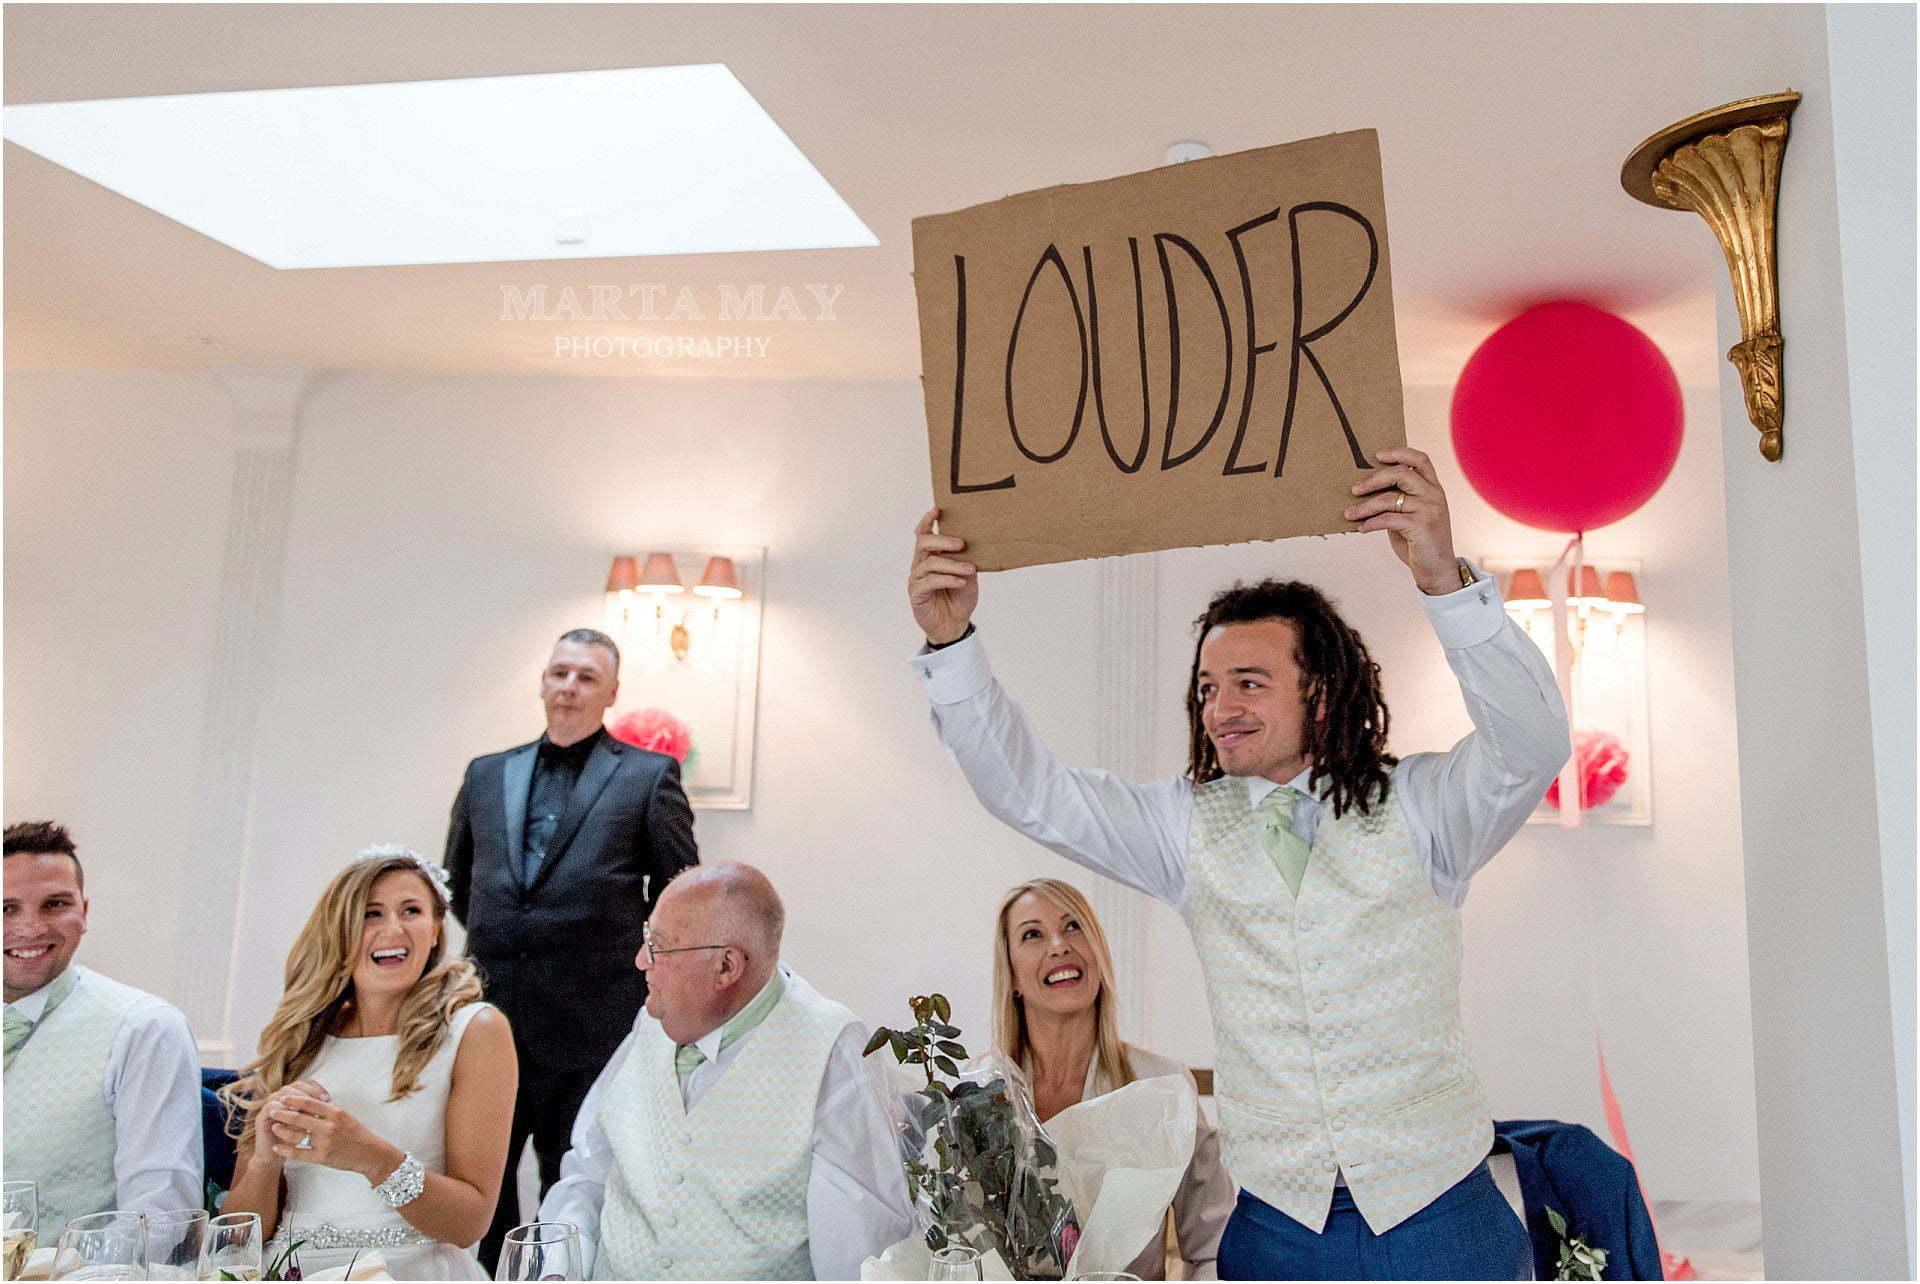 Lemore Manor weddings photographer